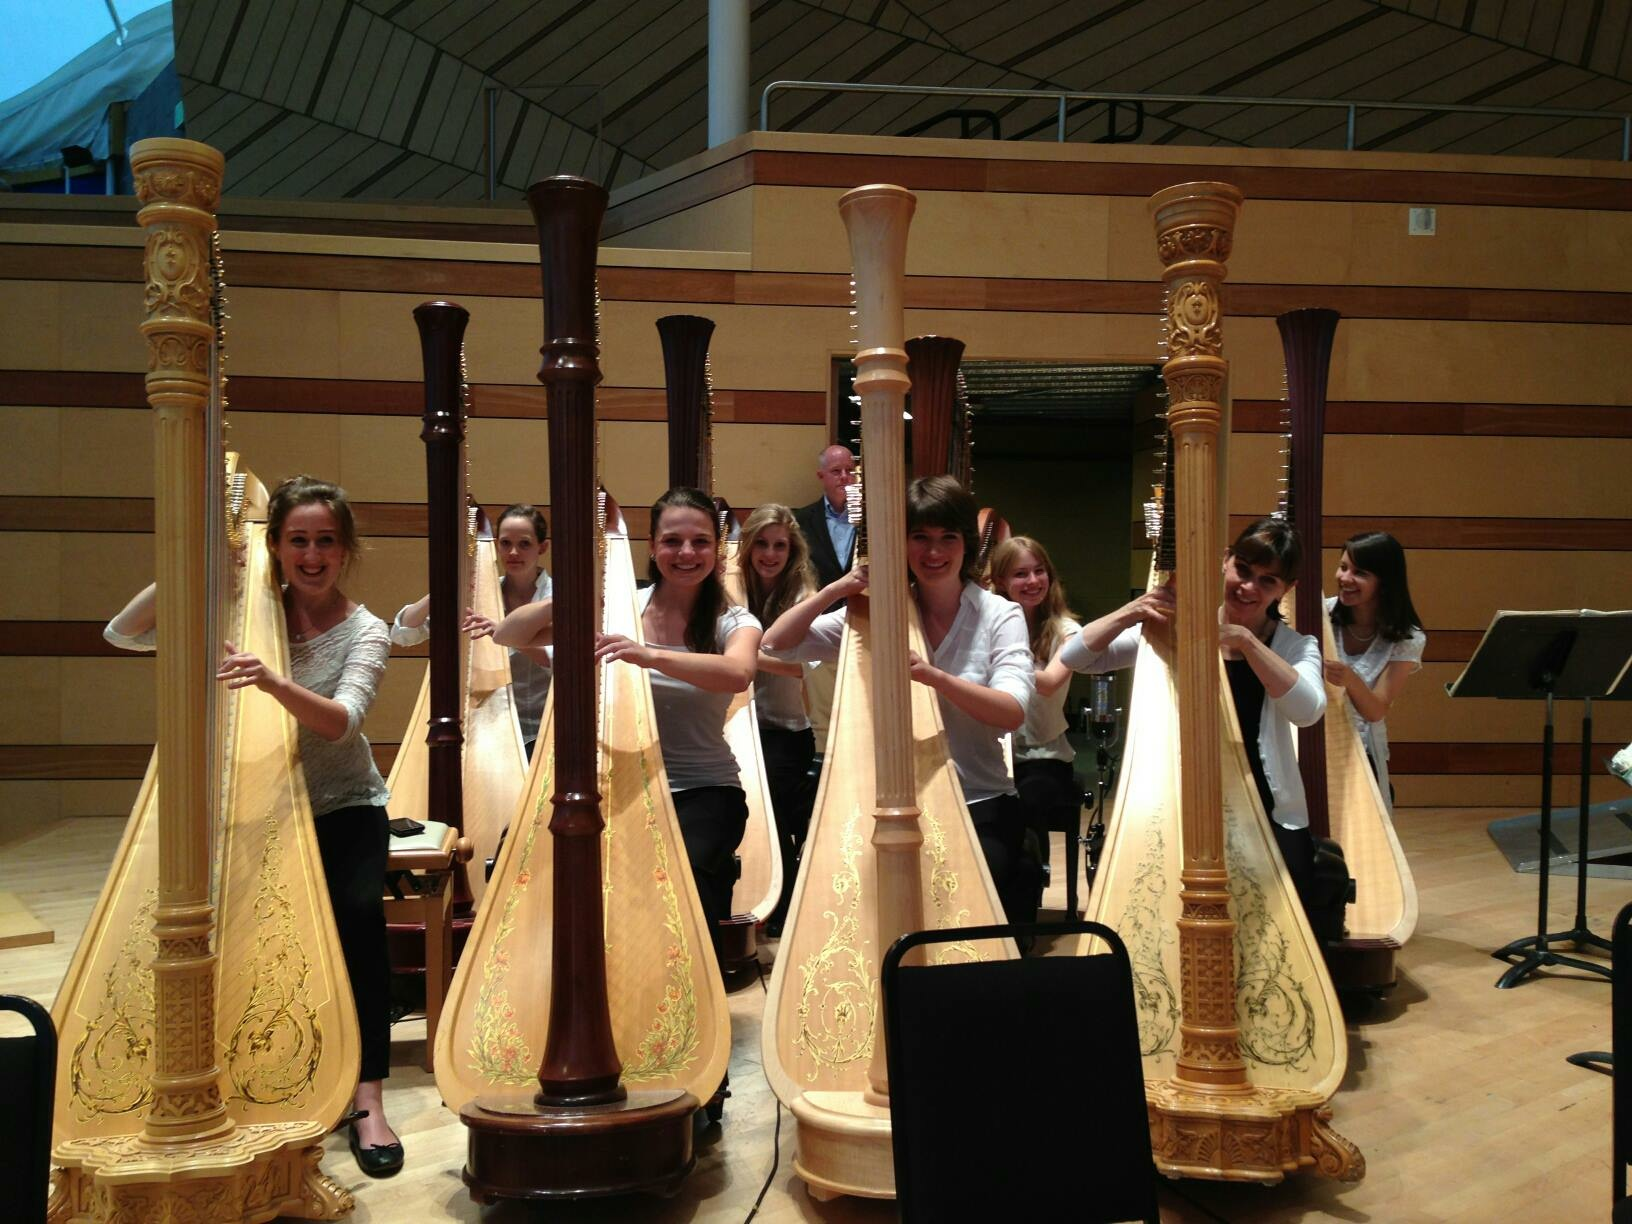 Aspen 2013: Wagner's Gotterdammerung with 8 harps!